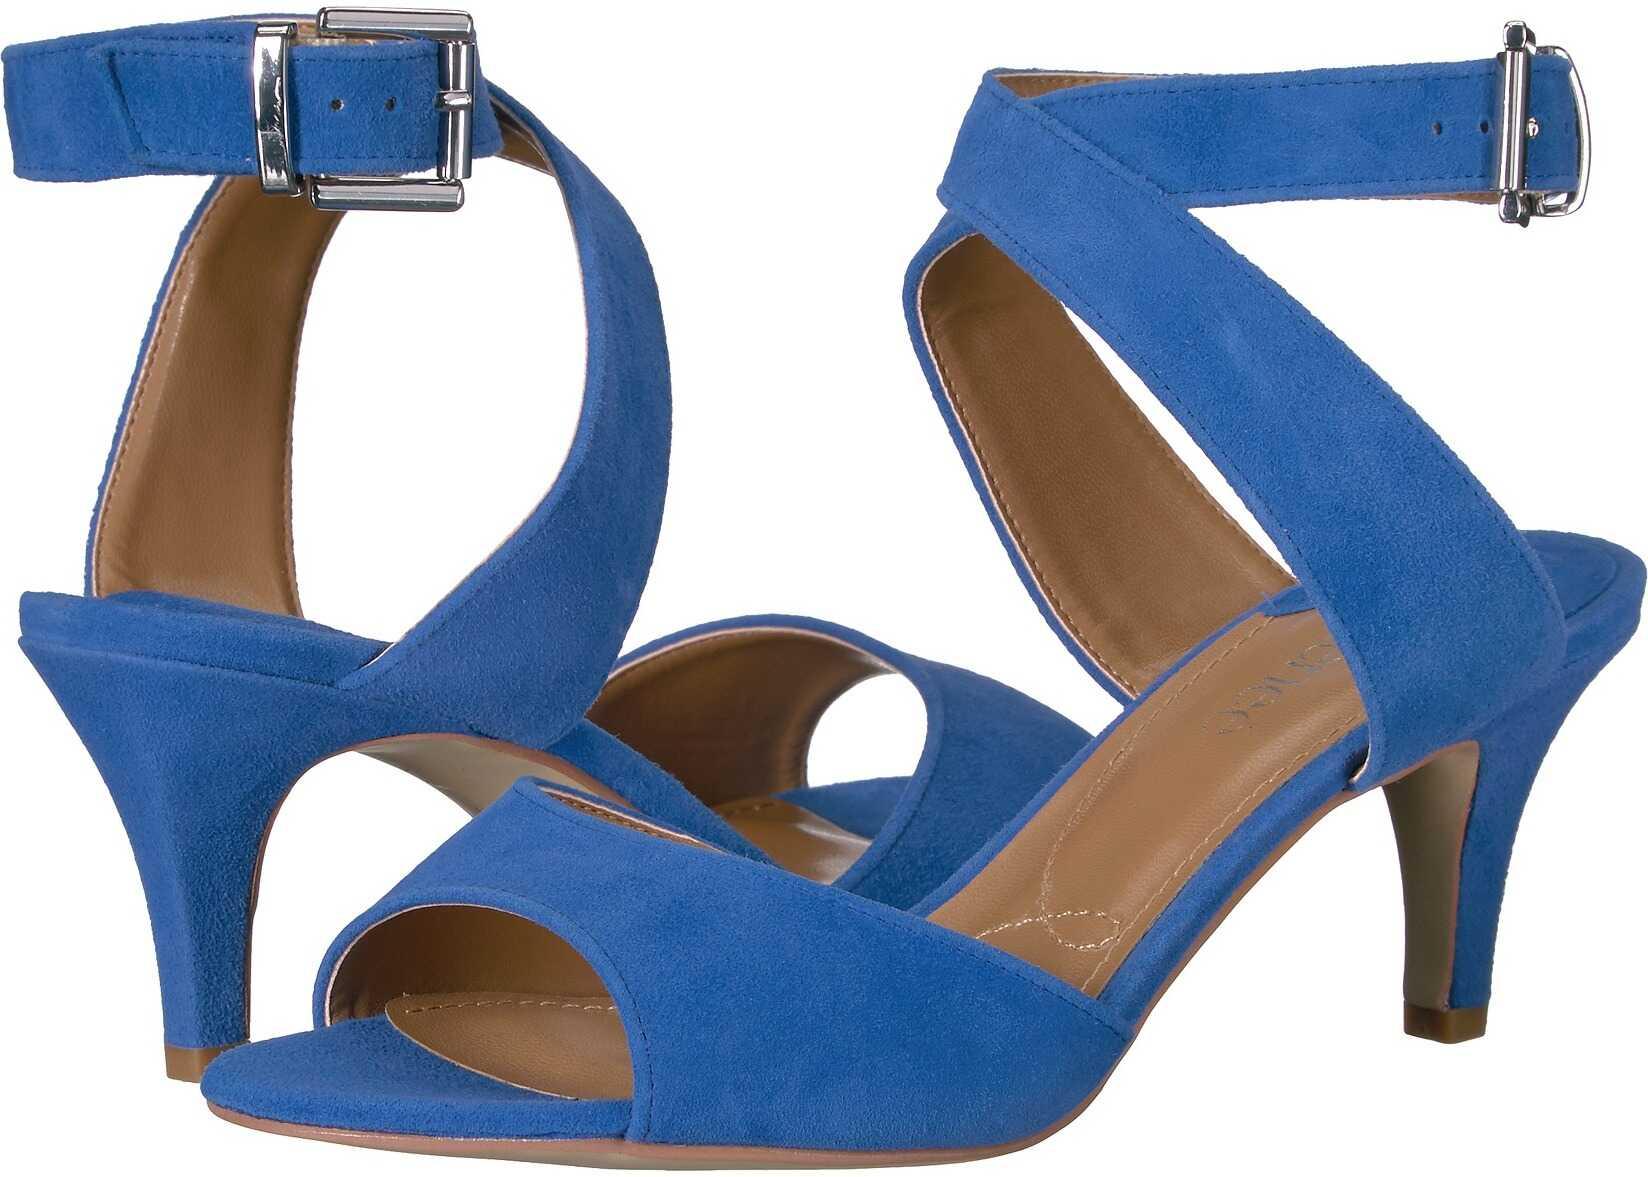 J. Renee Soncino Cobalt Blue